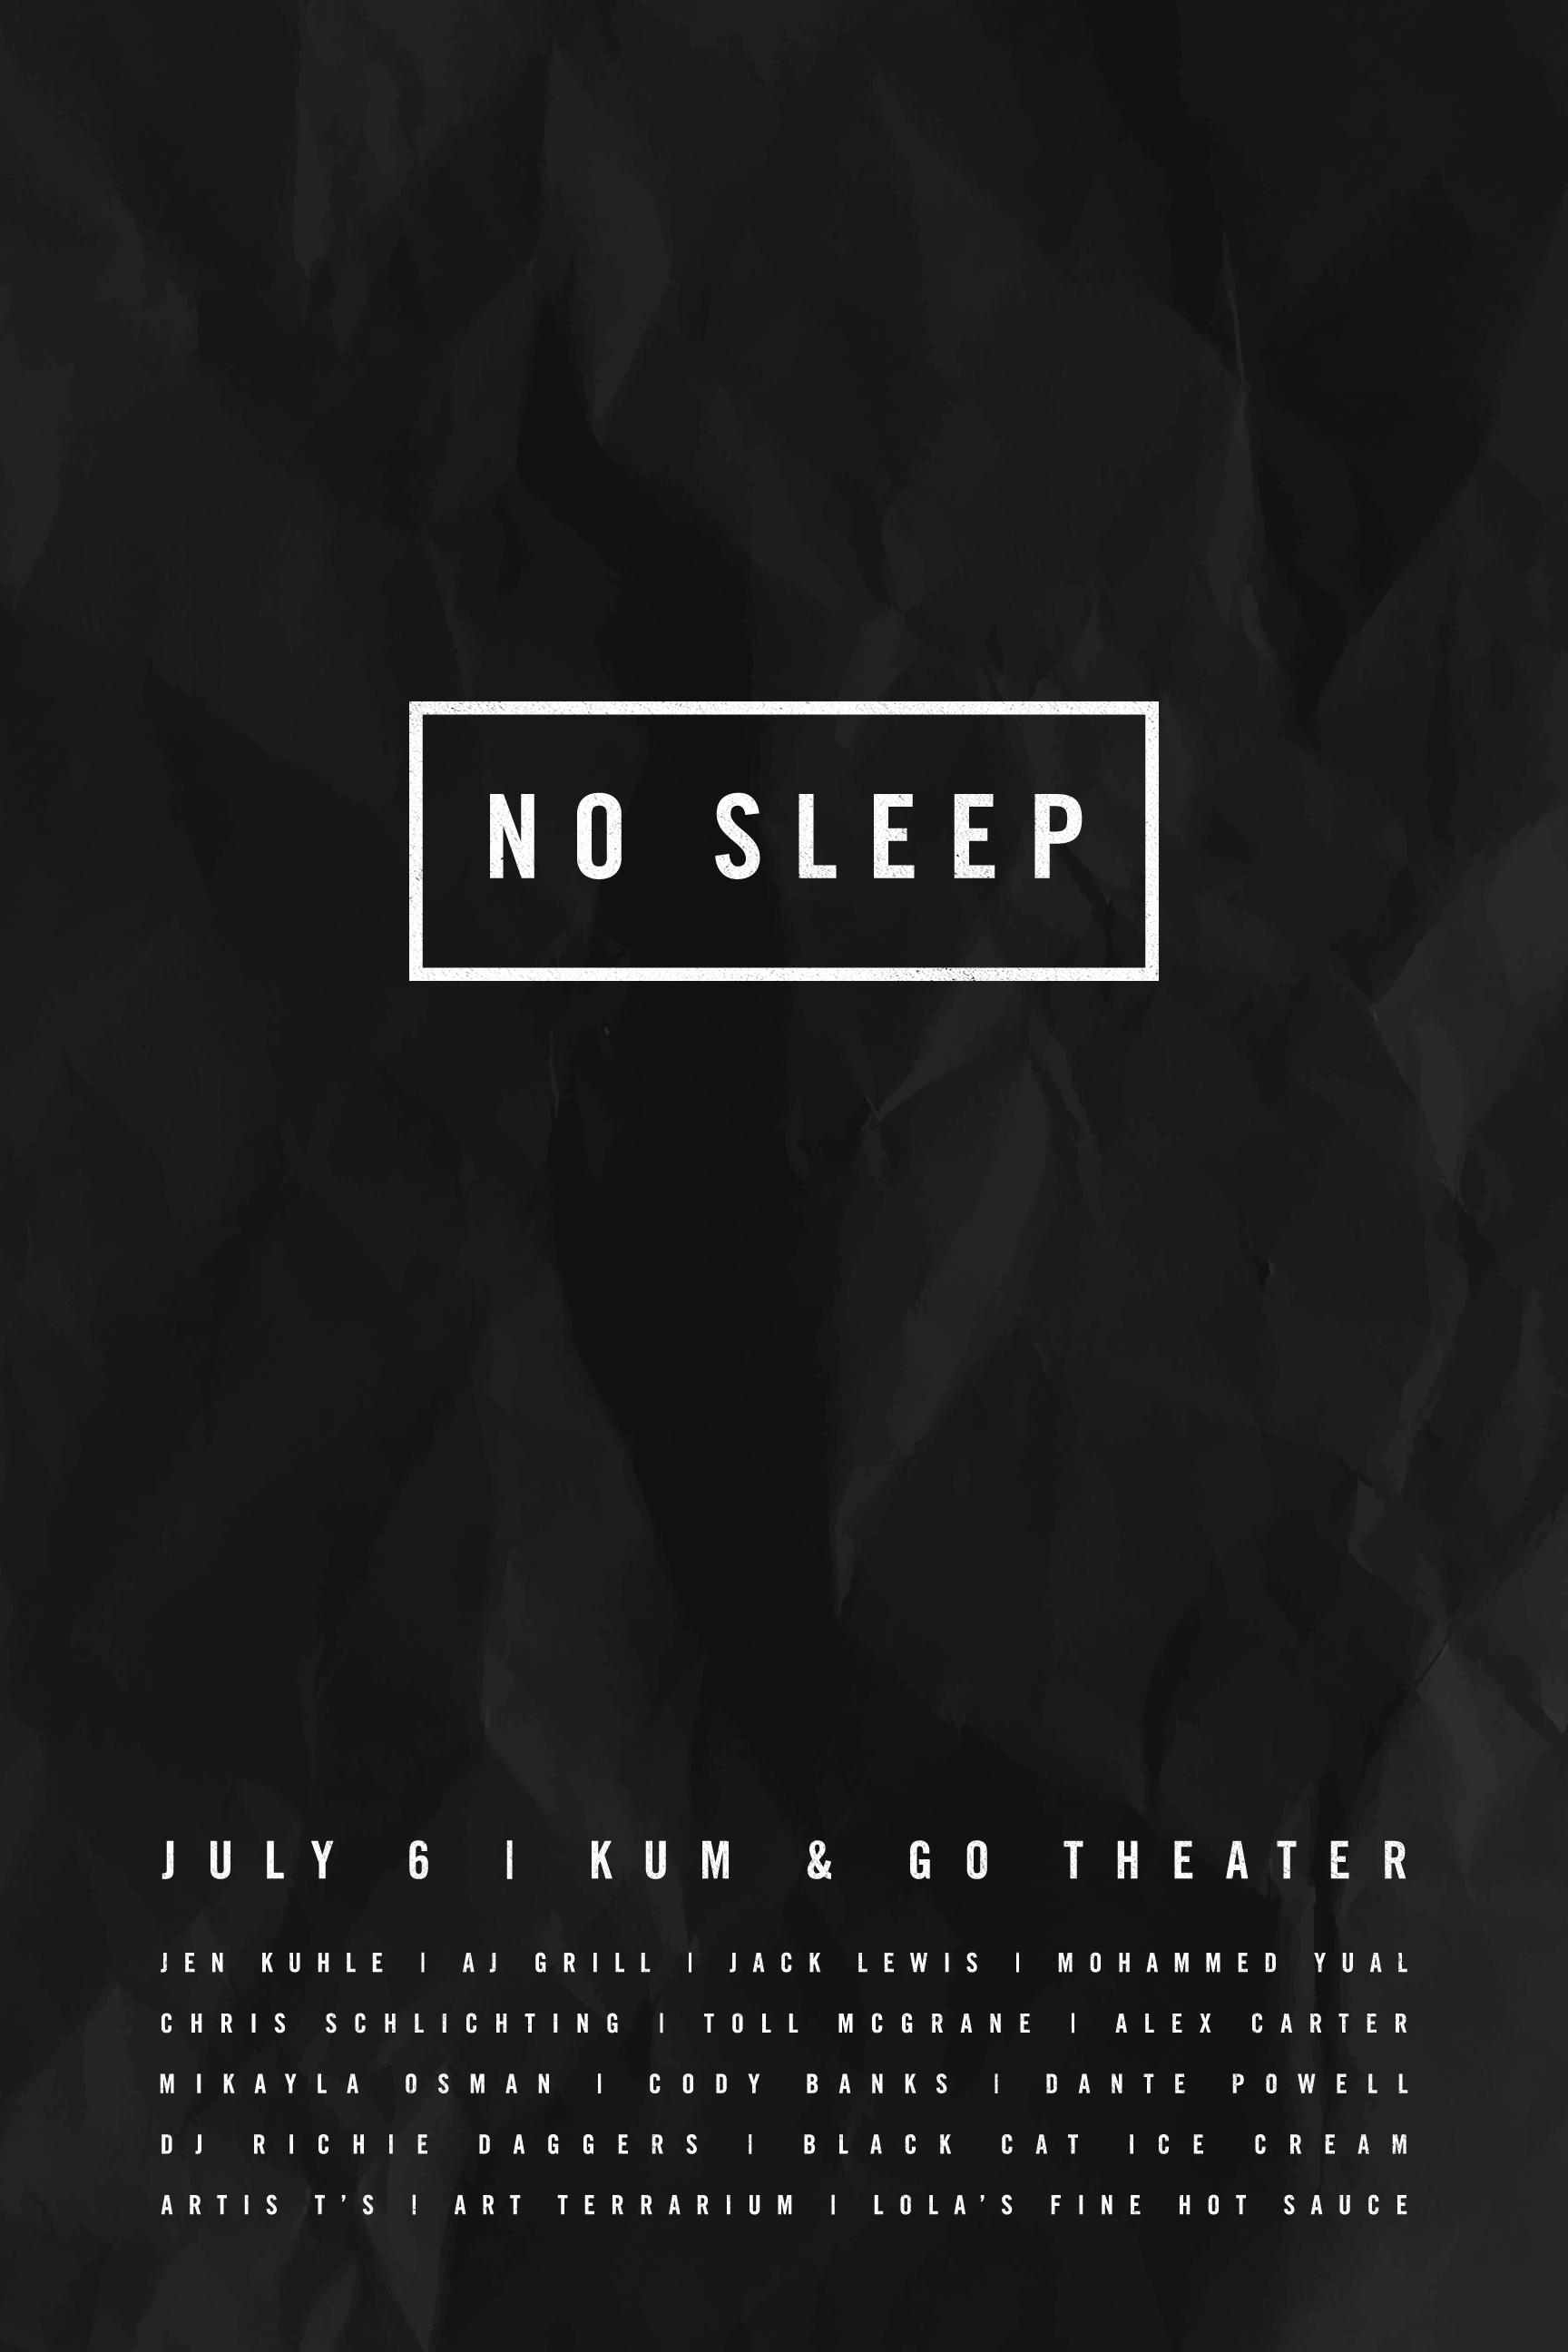 NOSLEEP_7_Poster.png